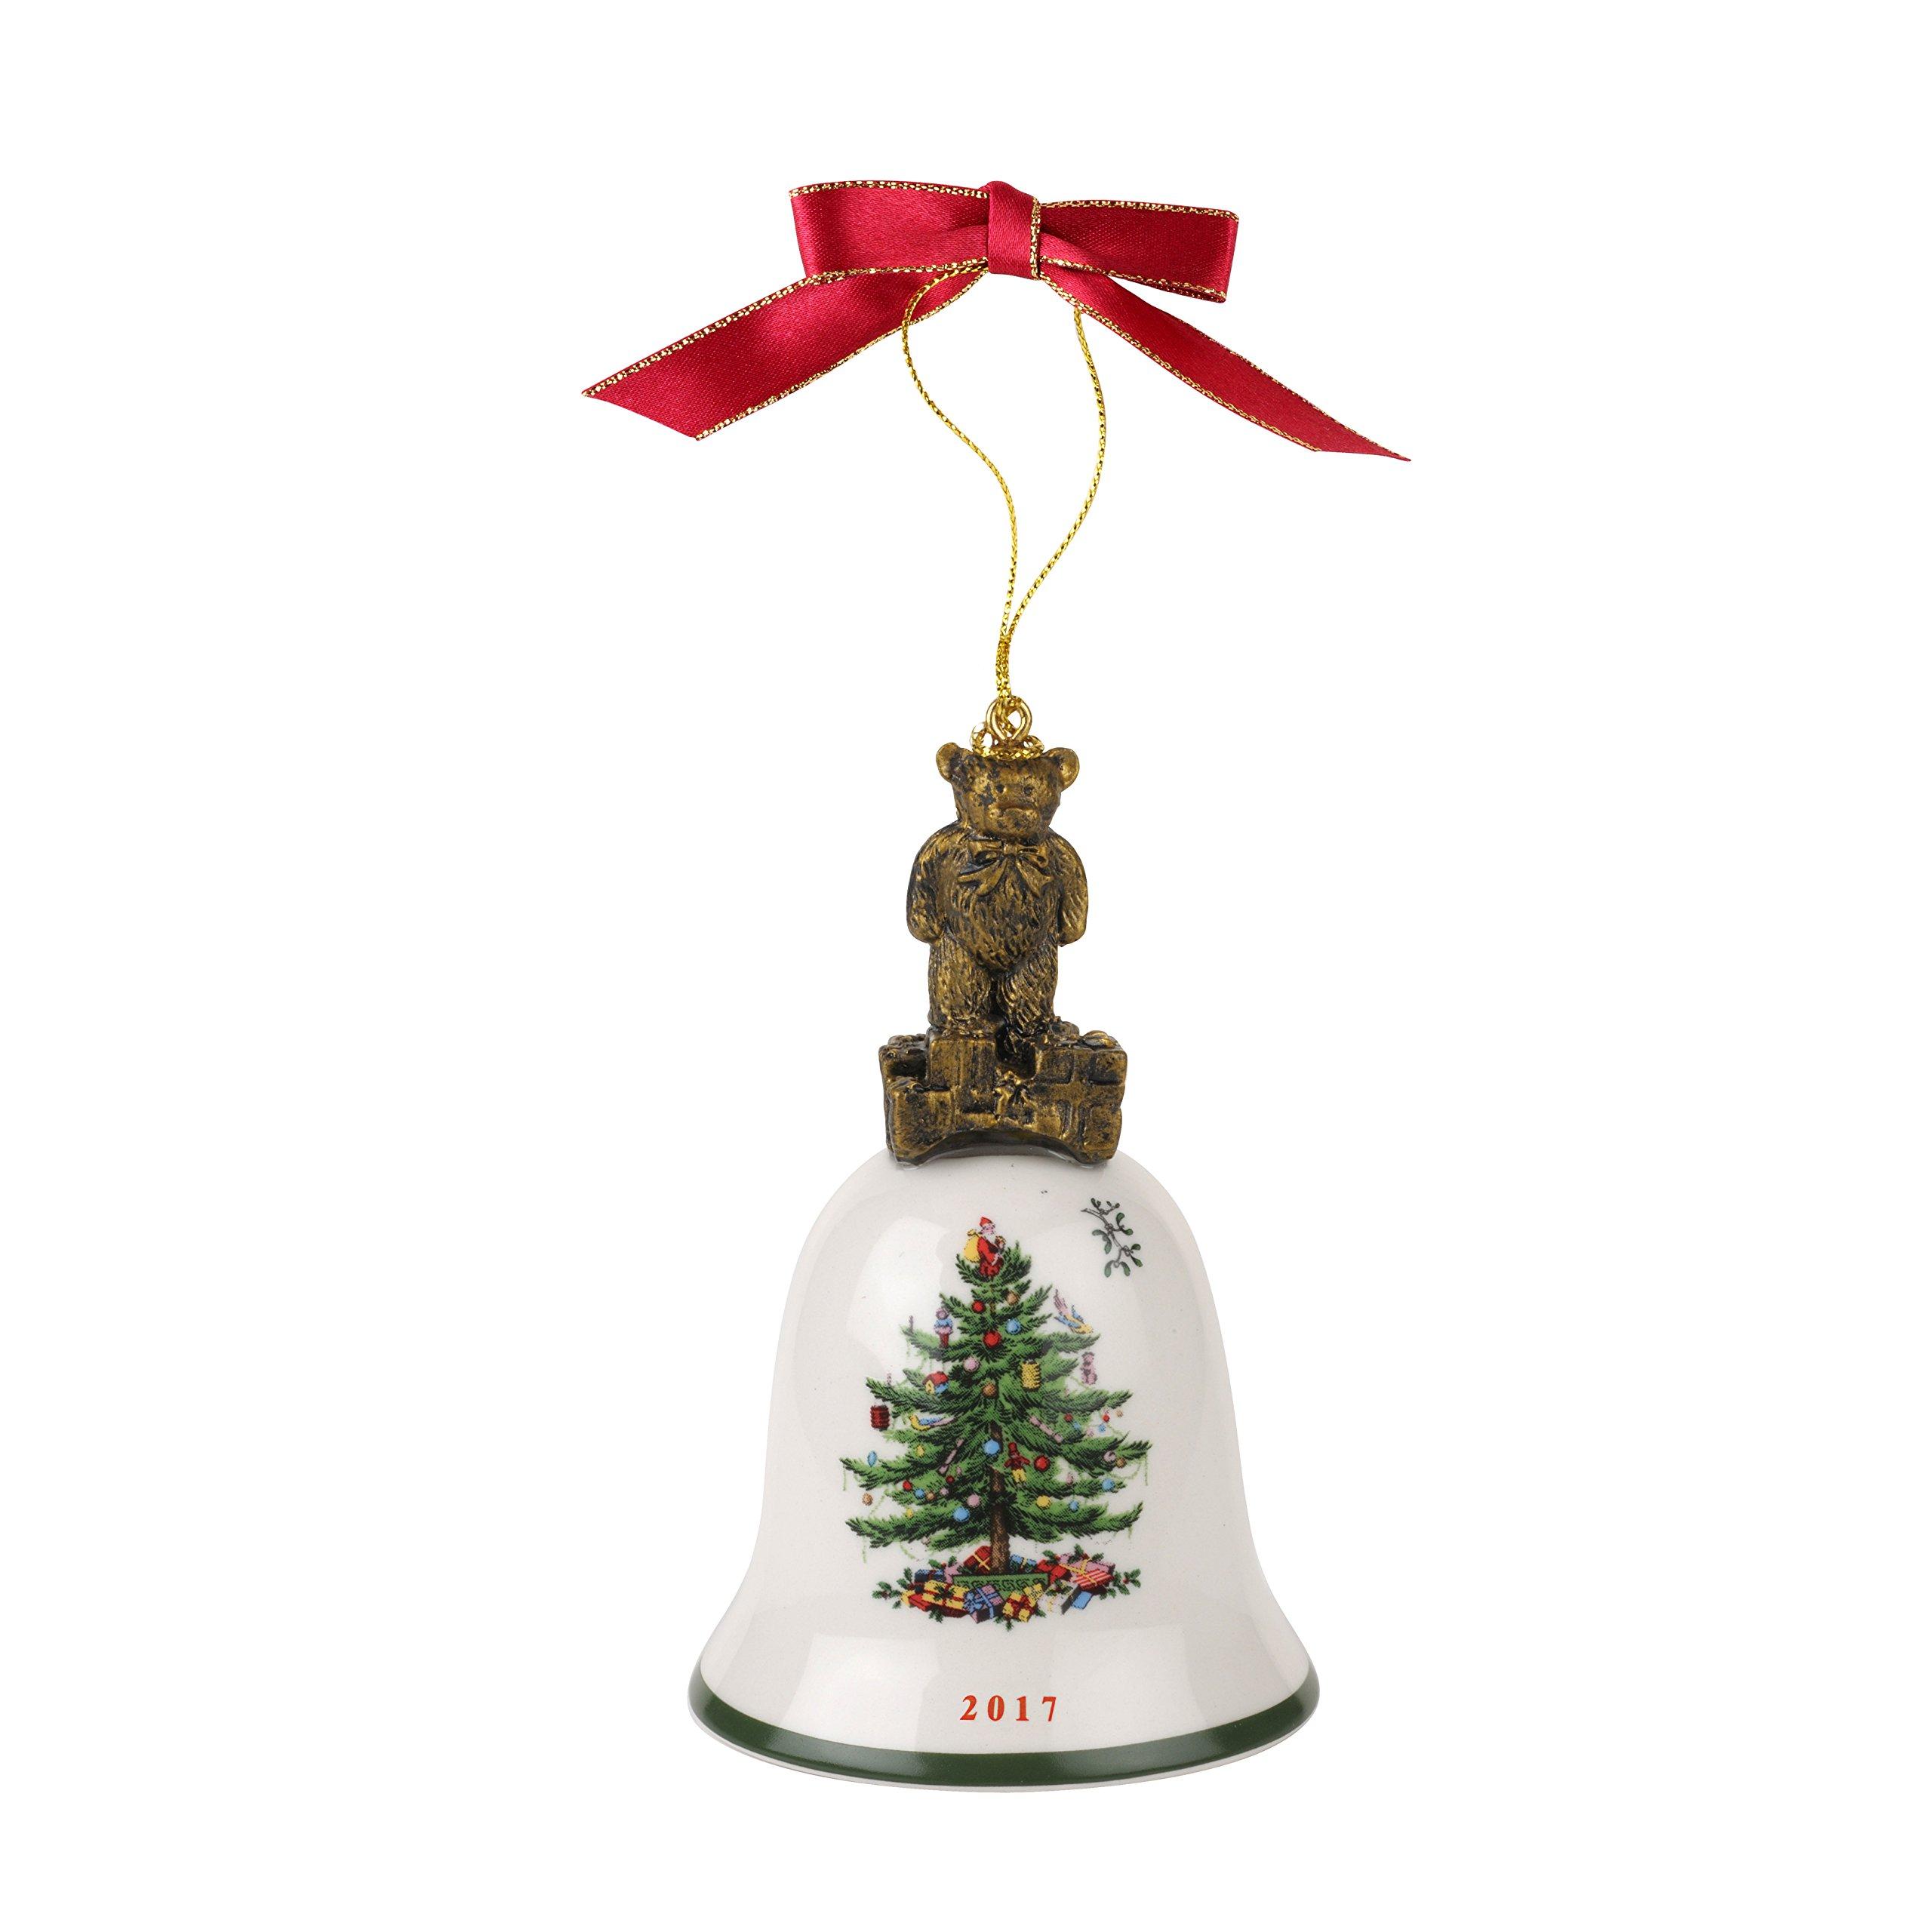 Spode Christmas Tree Annual Edition Ornament, Teddy Bear on Bell